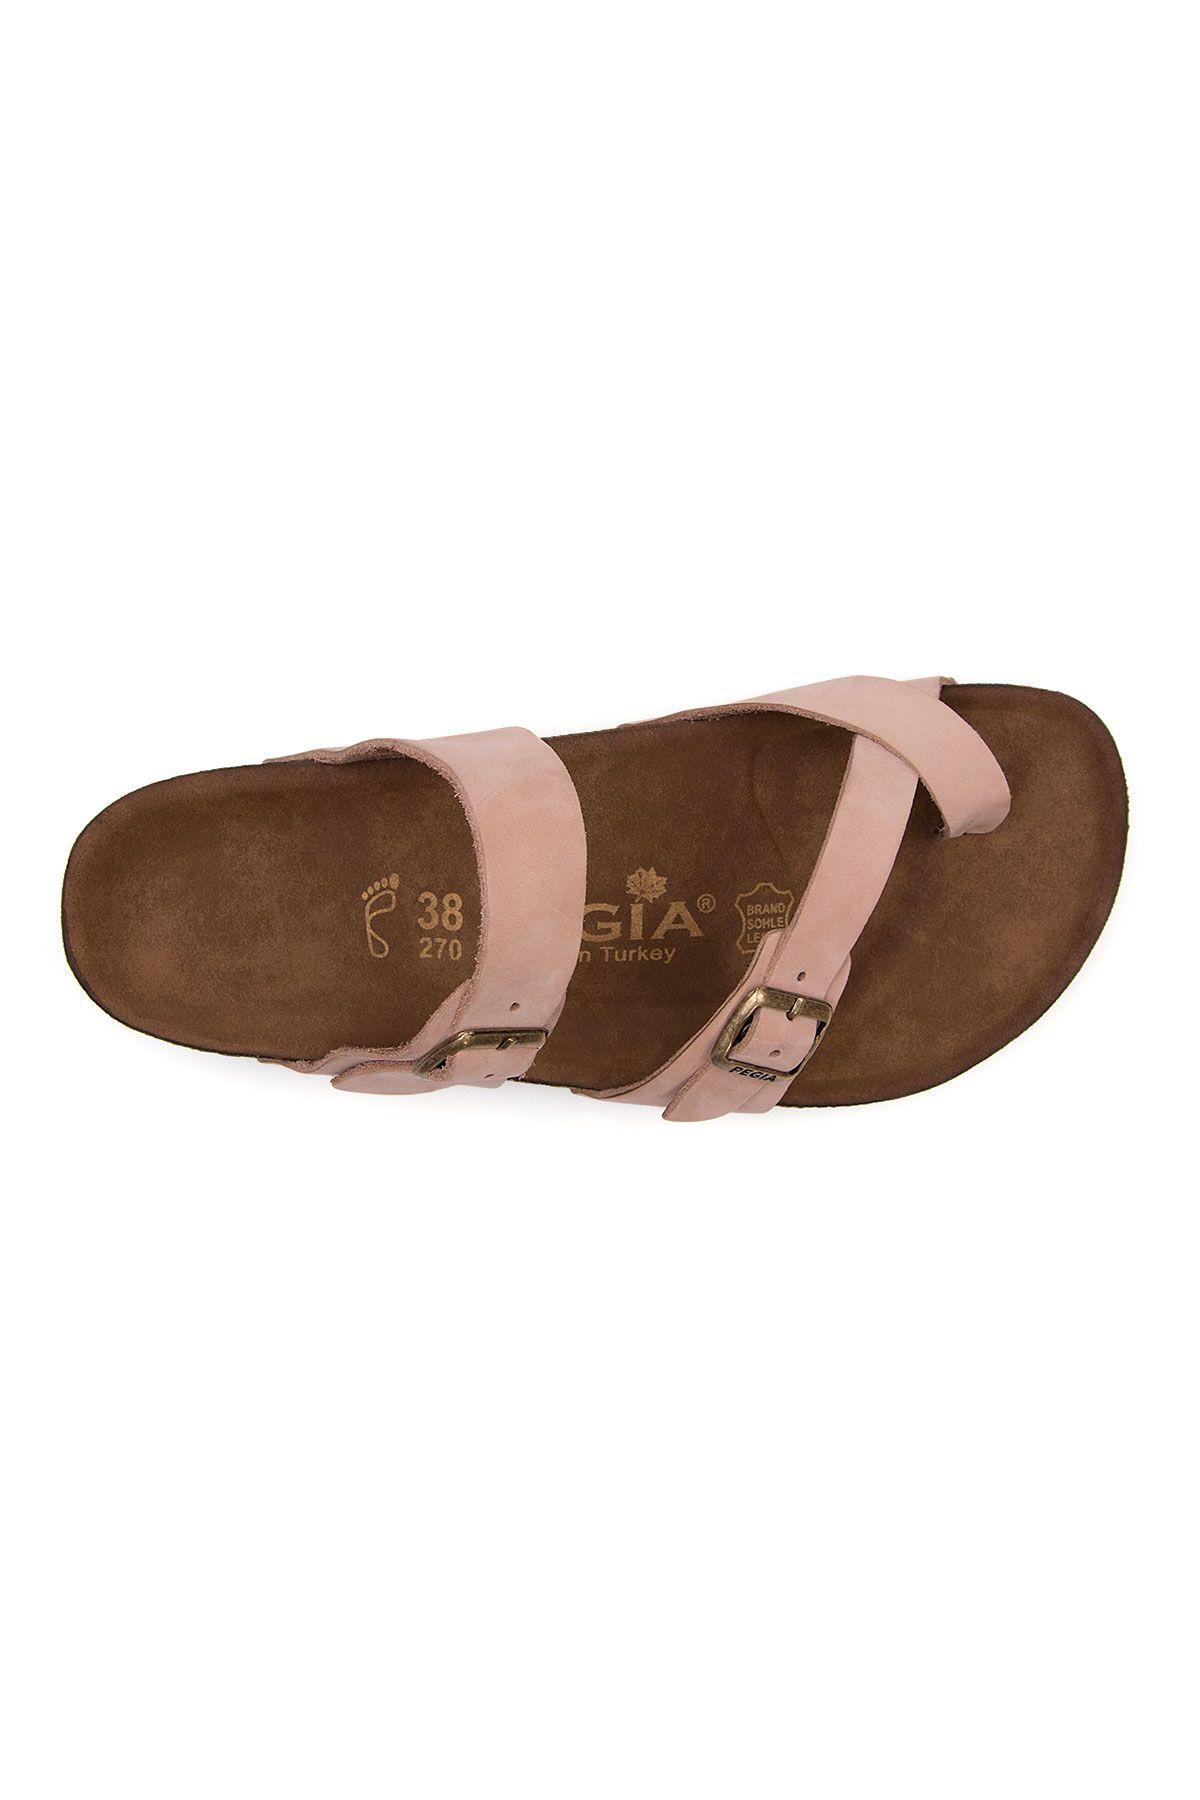 Pegia Women's Leather Slippers 215522 Powdery